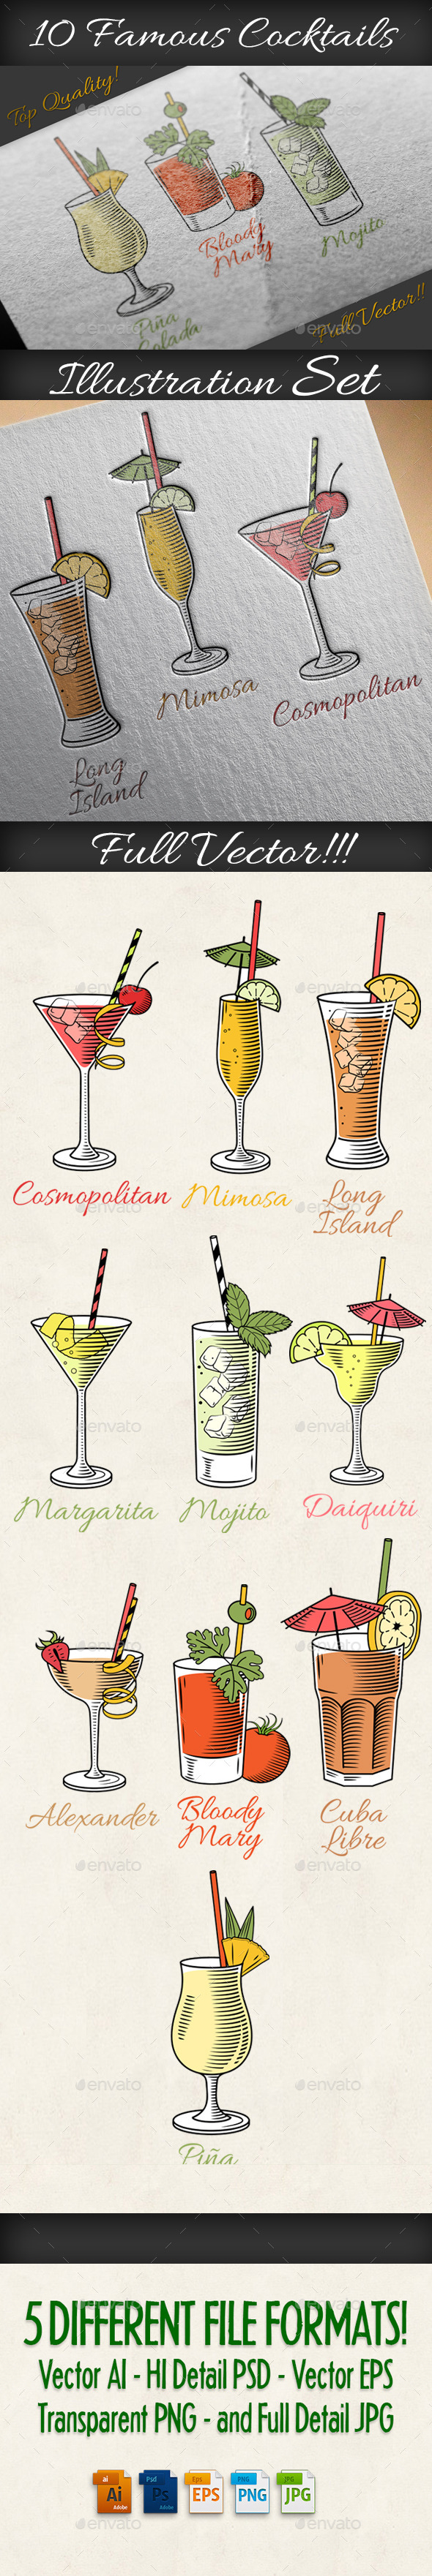 Cocktails Illustrations Set - Food Objects